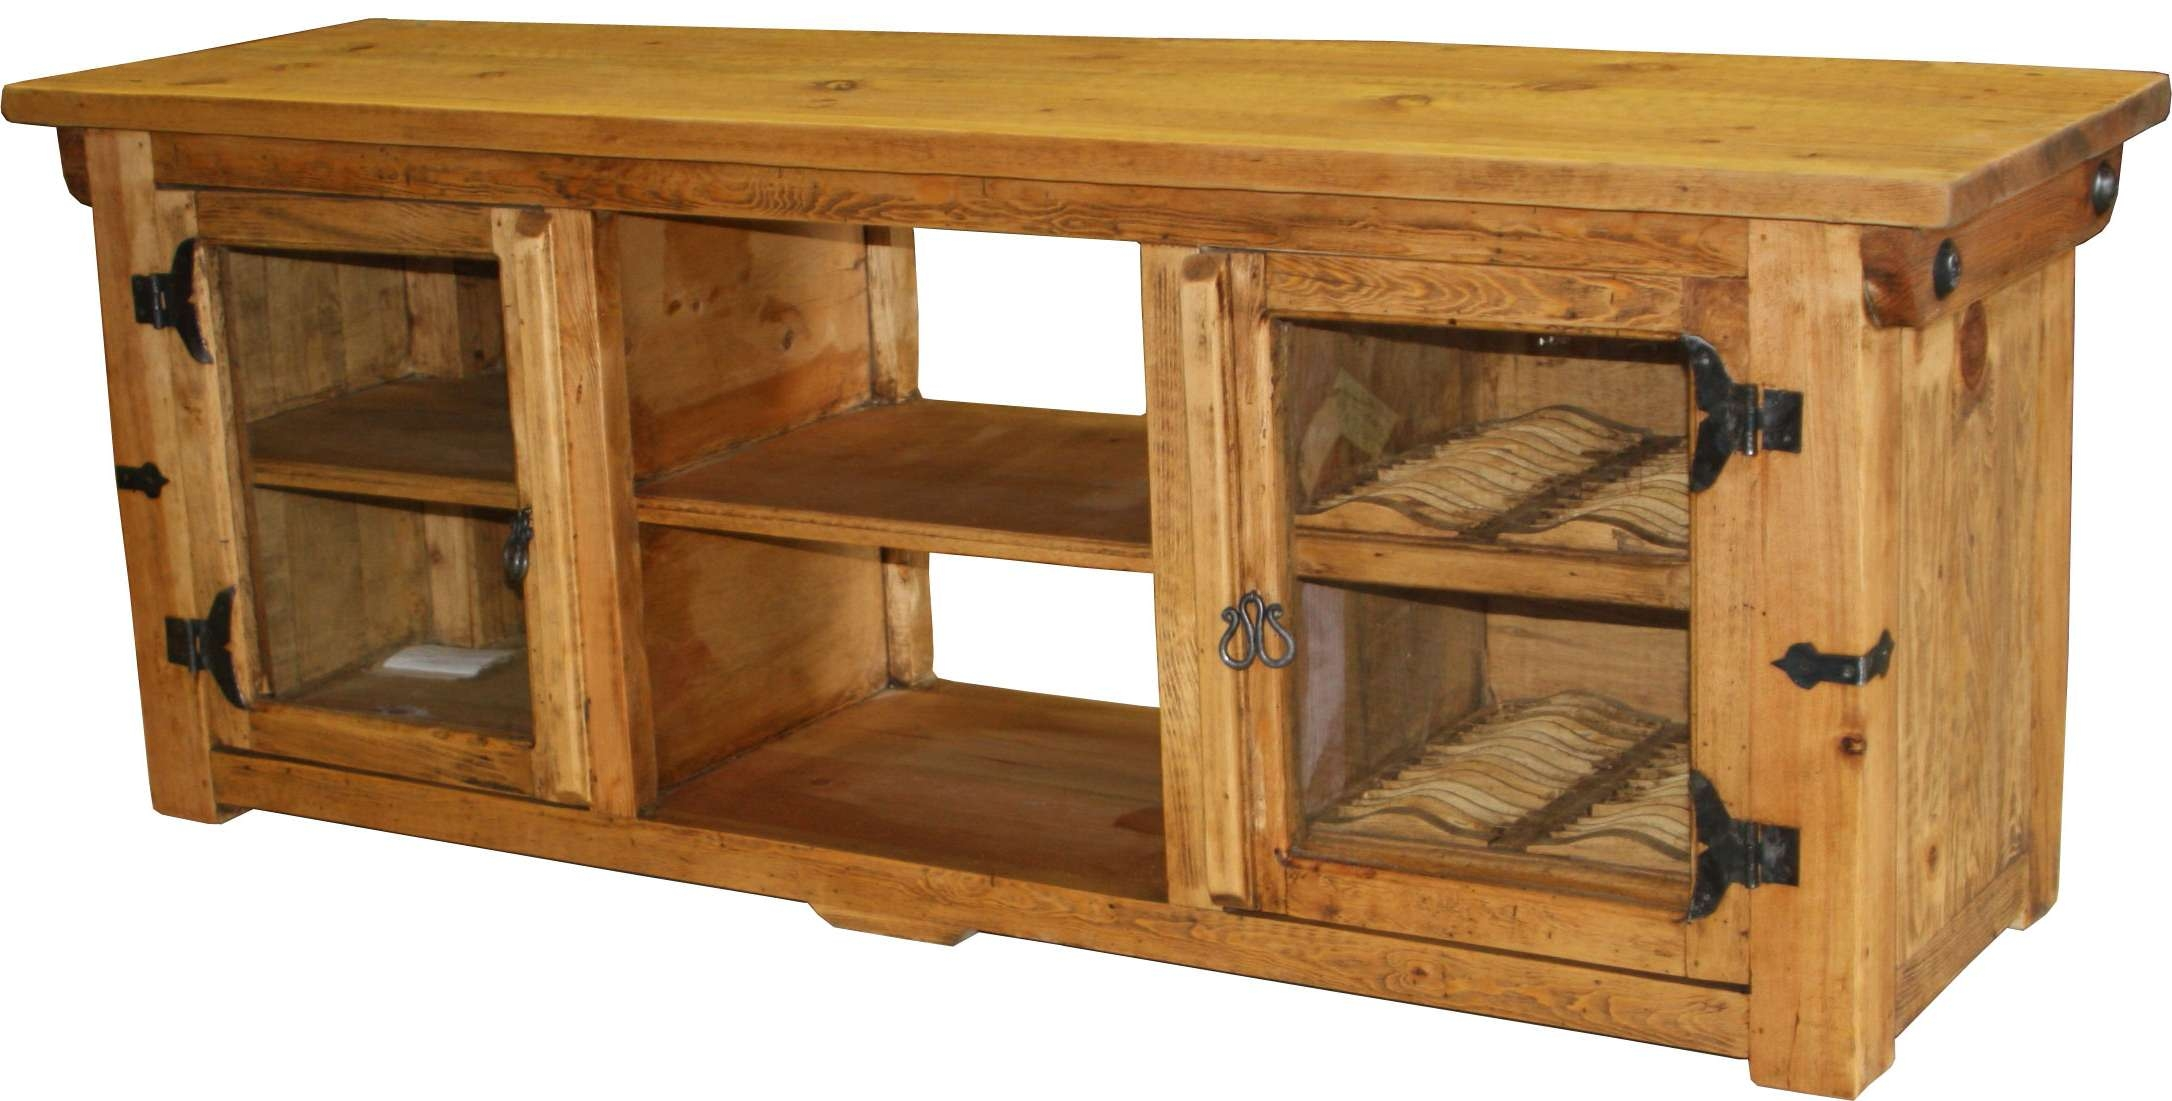 Lauro Tv Stand @ Durango Trail Rustic Furniture In Rustic Furniture Tv Stands (View 6 of 20)